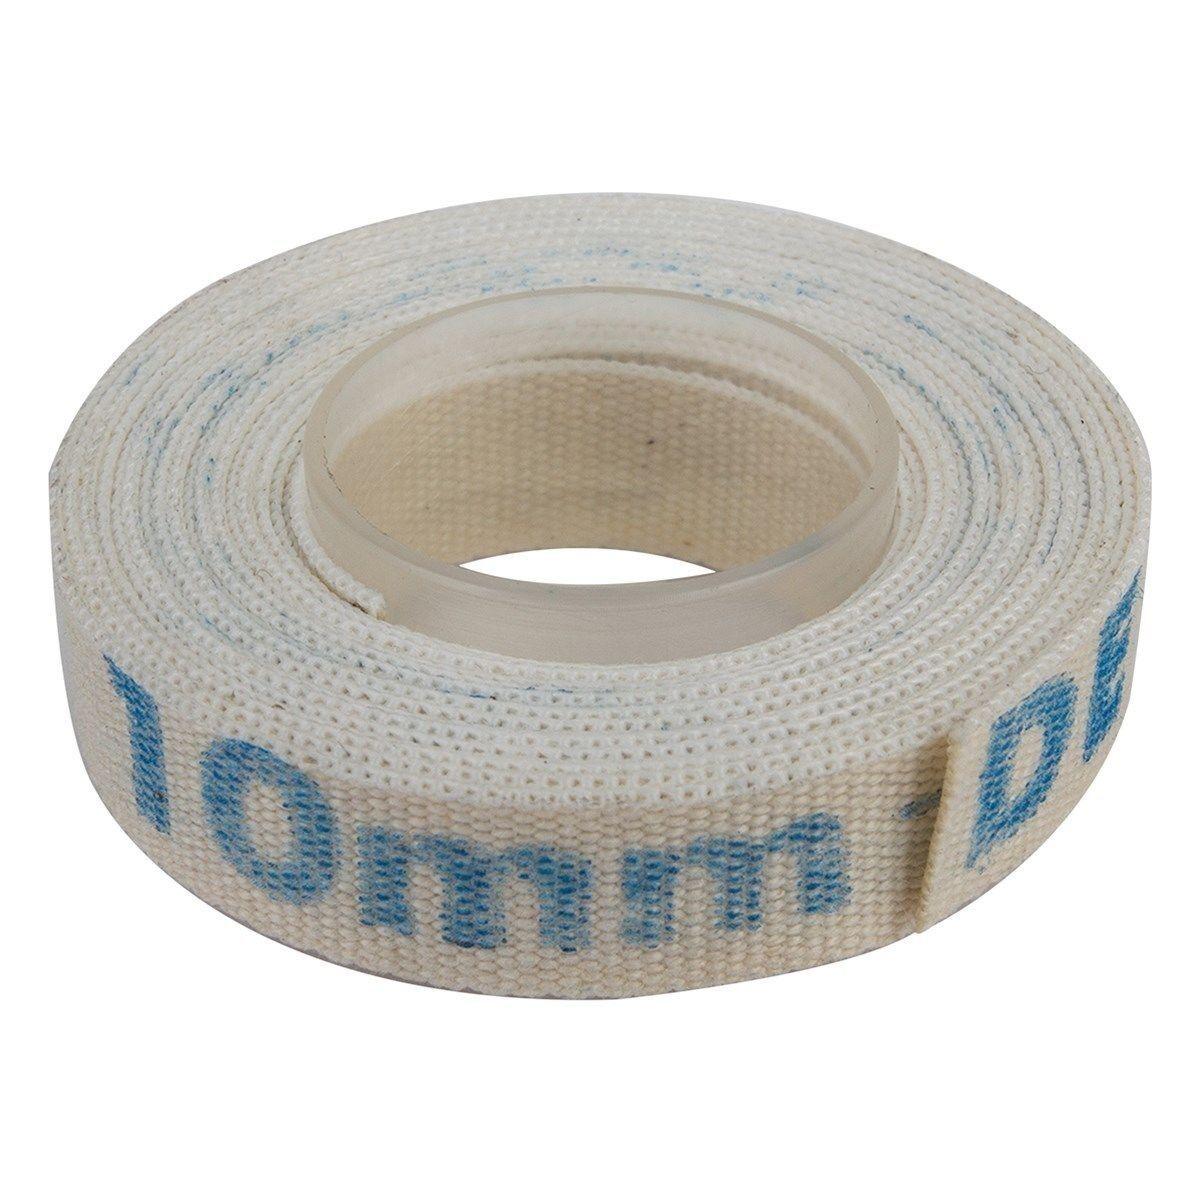 Velox Rim Tape 16Mm Wide #51